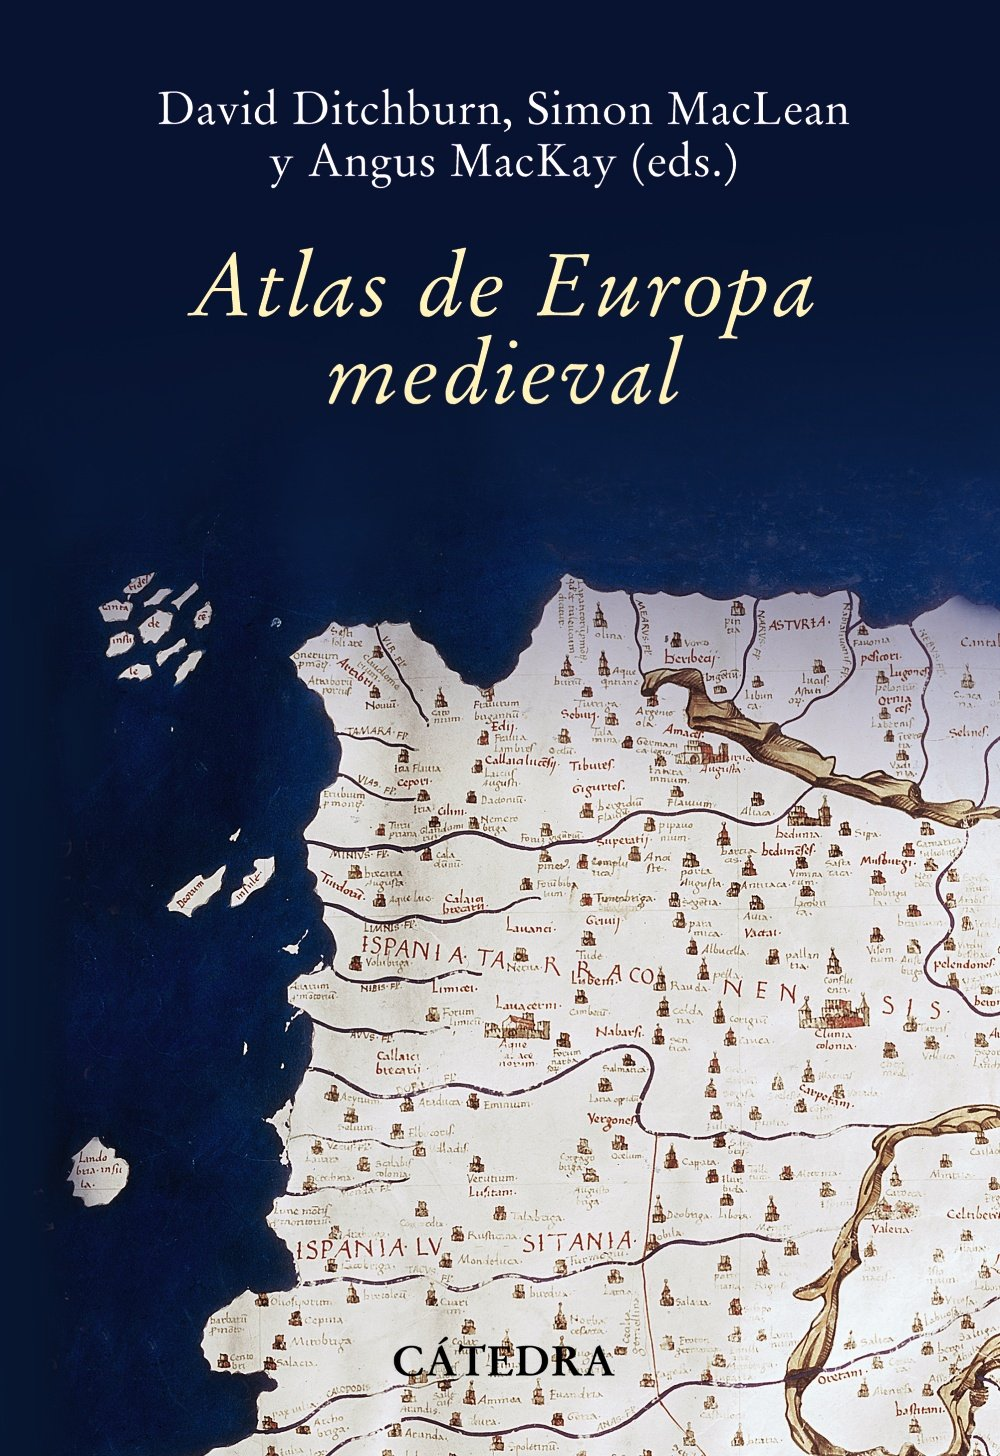 Atlas de Europa Medieval (Historia. Serie mayor): Amazon.es: MacKay, Angus, Ditchburn, David, MacLean, Simon: Libros